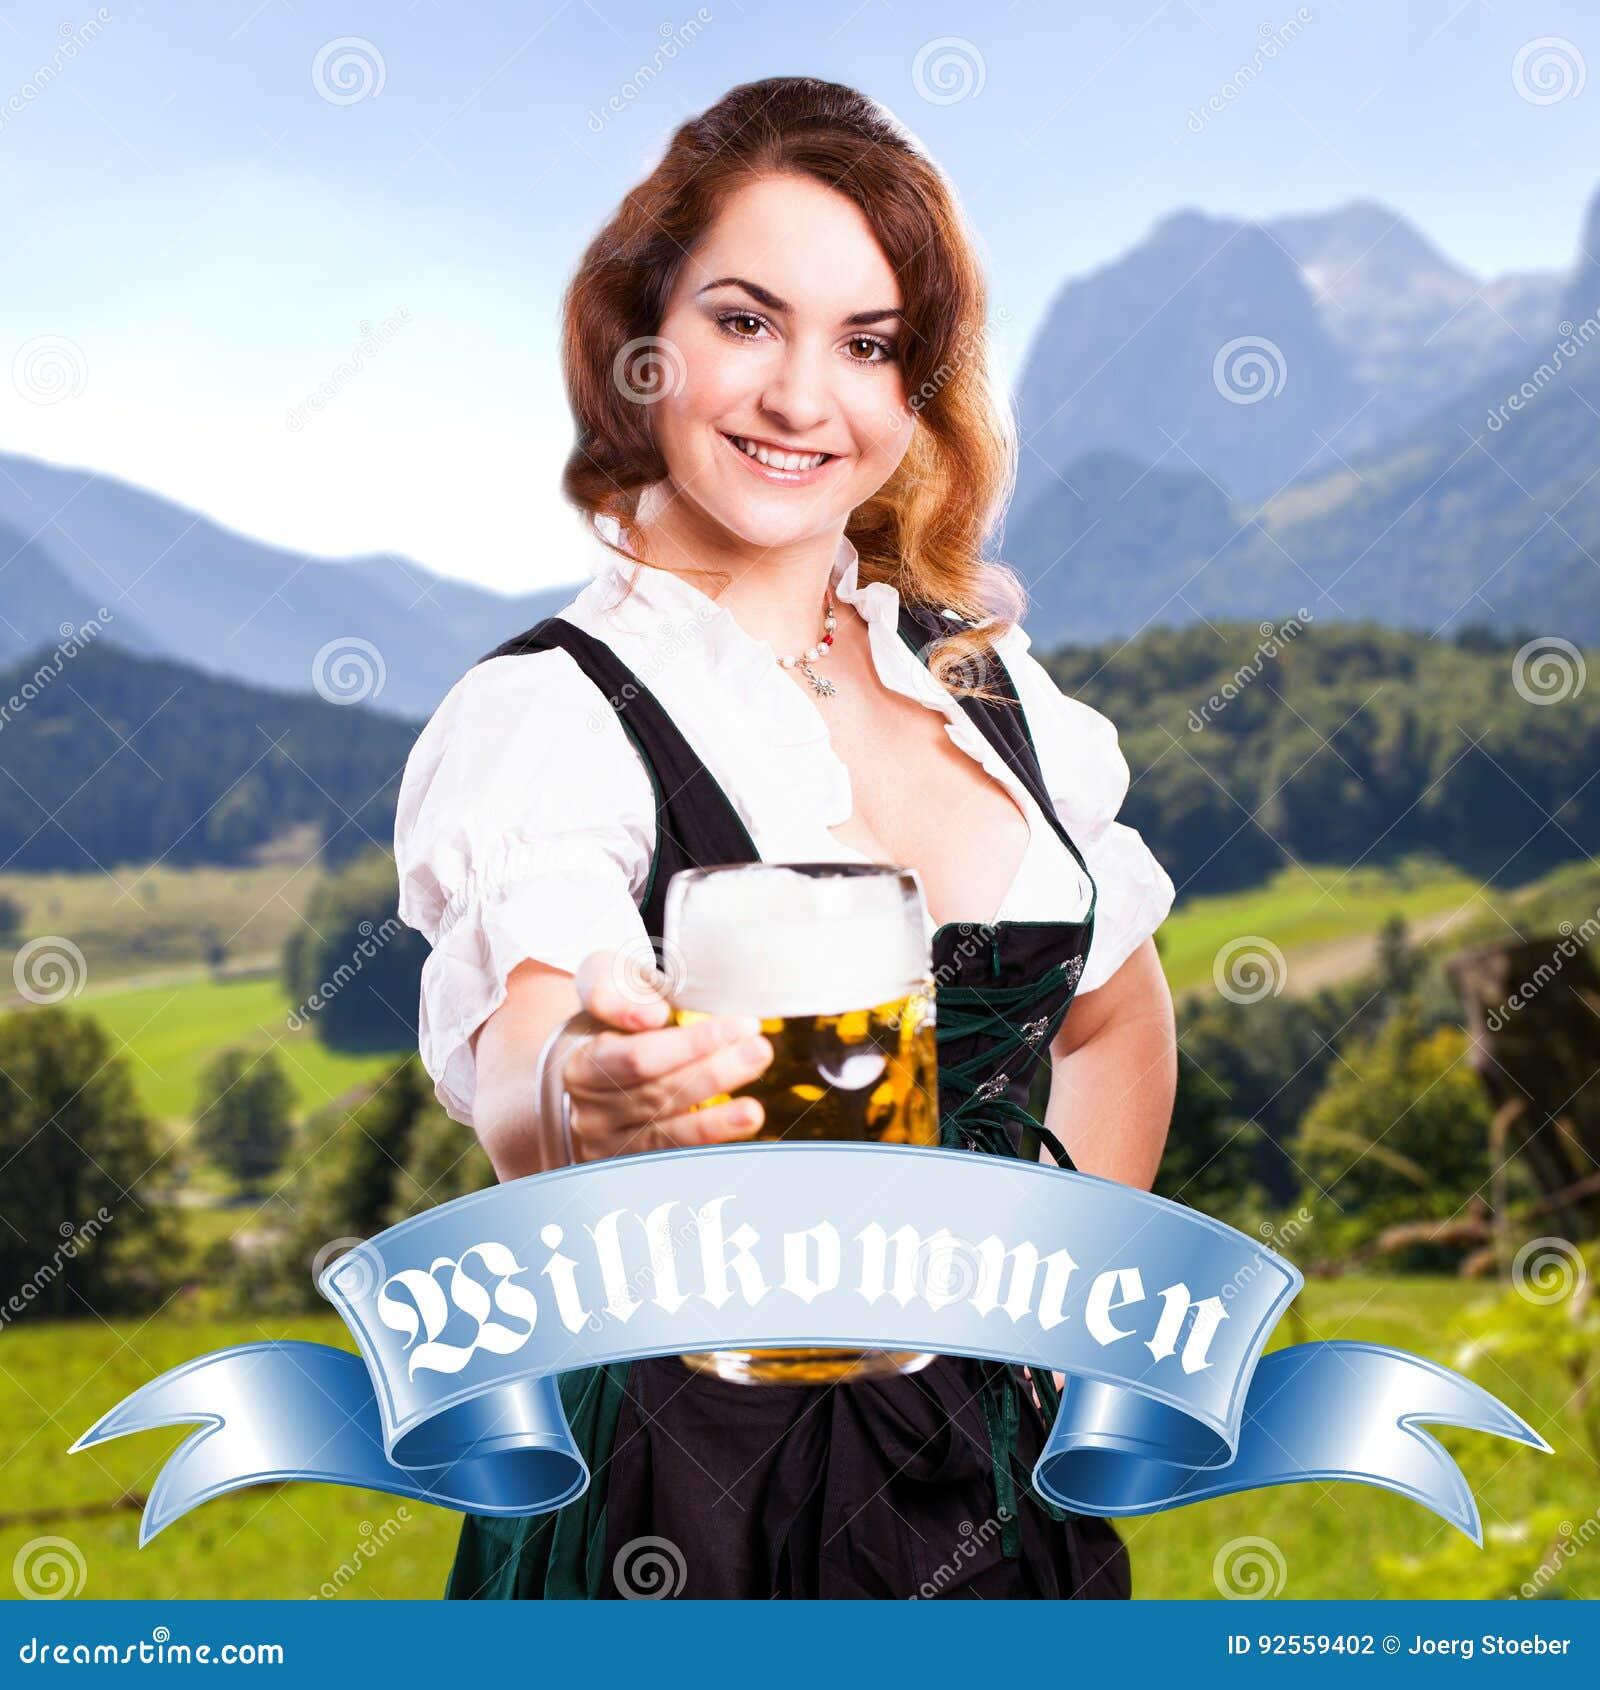 Beautiful woman in a traditional bavarian dirndl